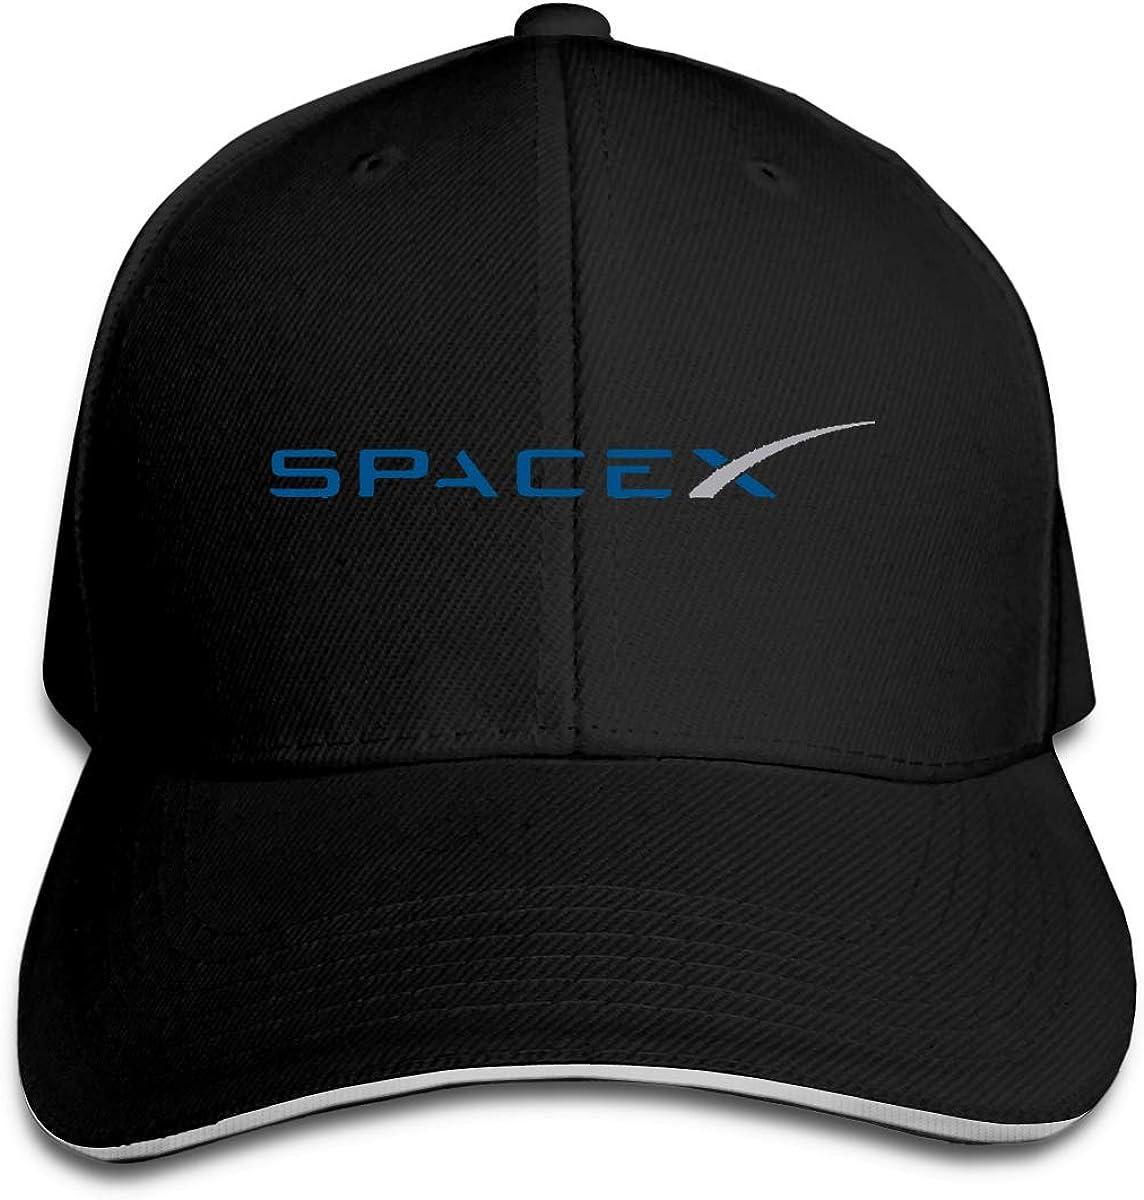 Unisex Classic Cowboy Hats Adjustable Fits Sports Outside Baseball Cap Snapback Hat